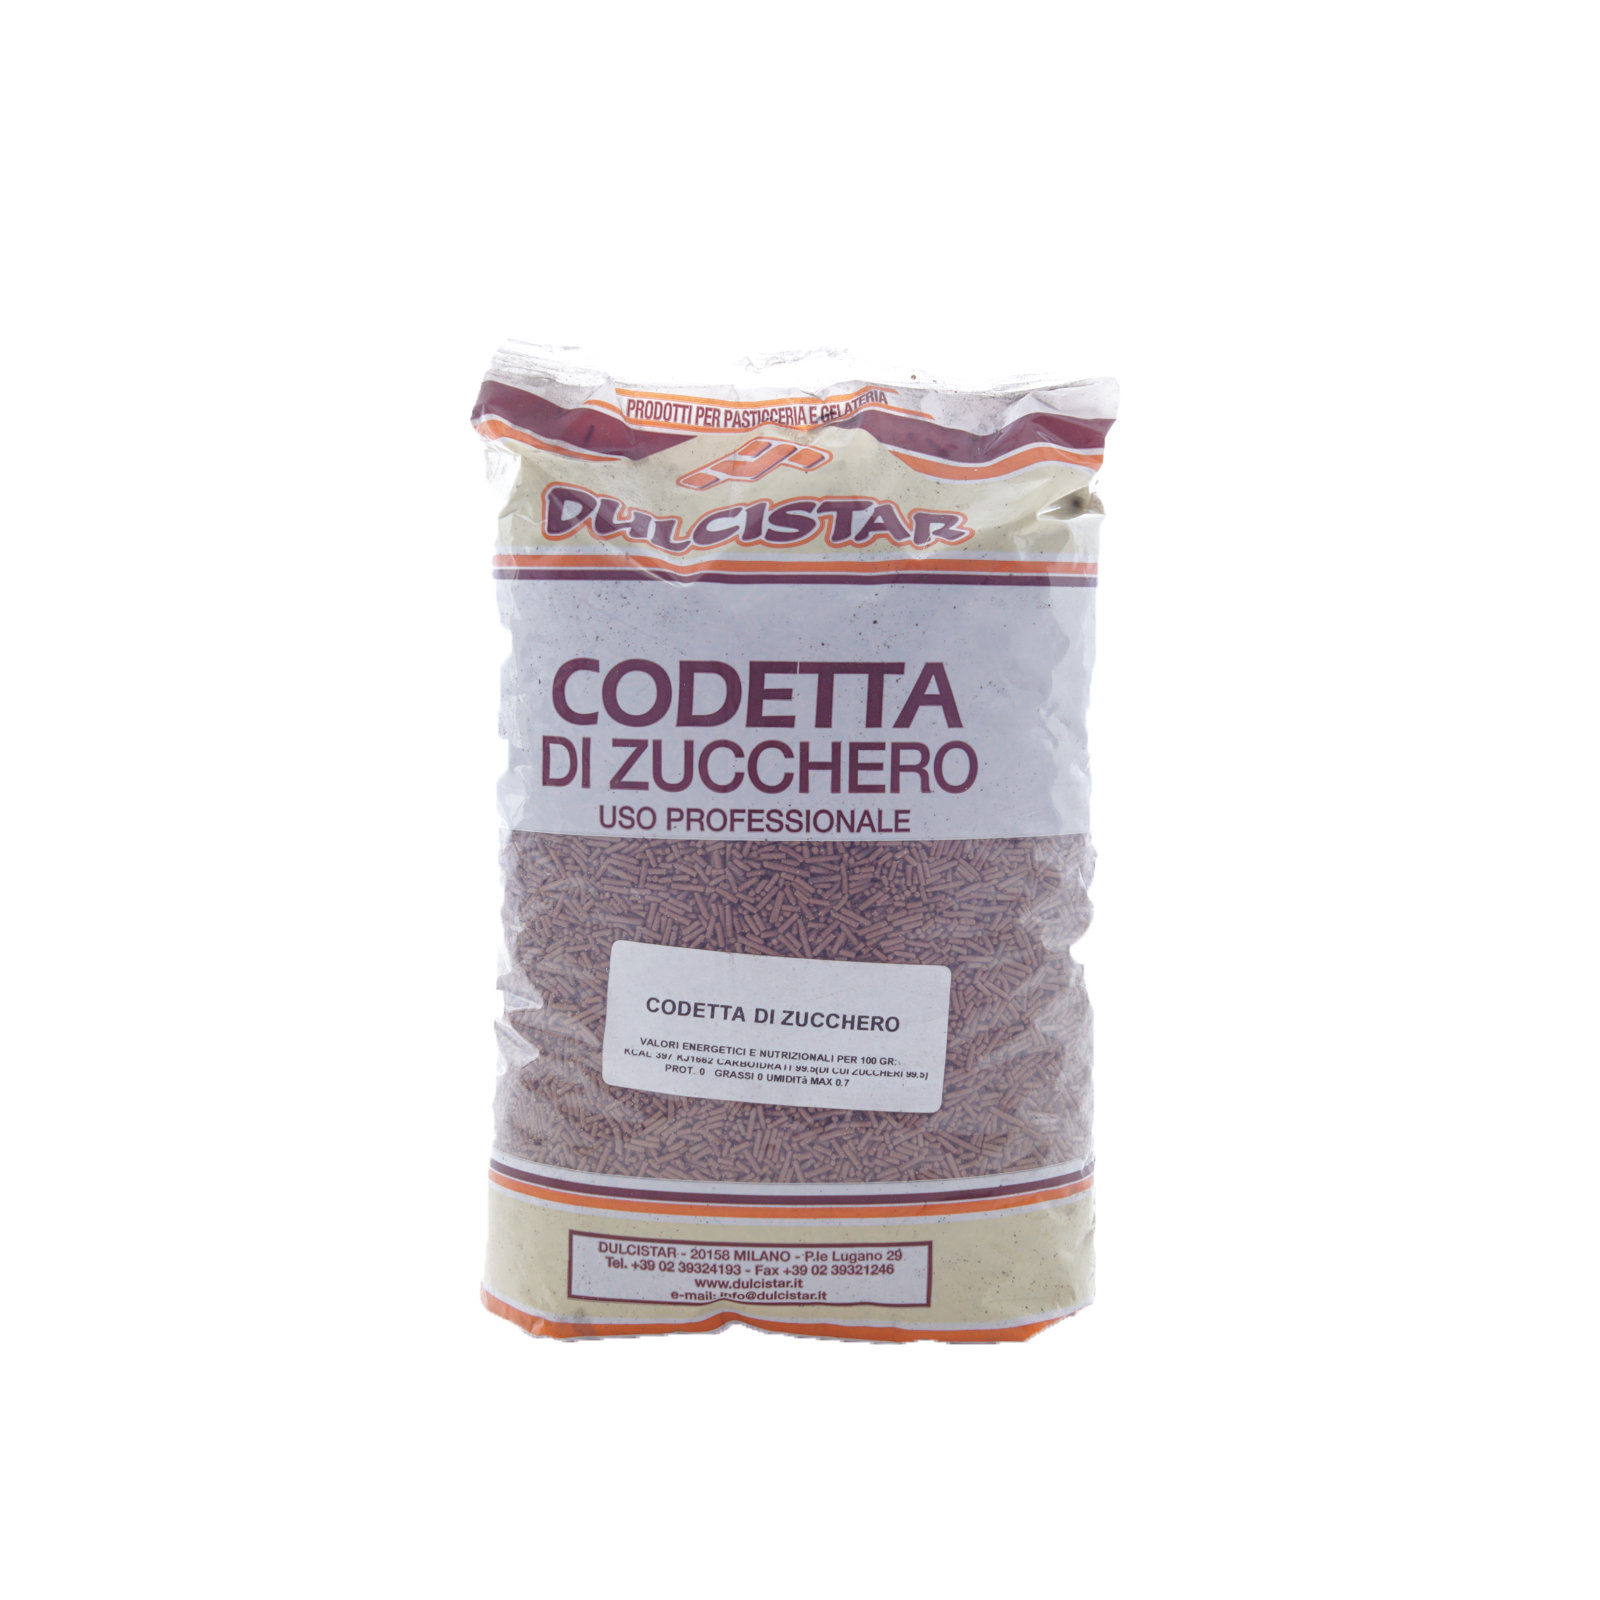 DULCISTAR – CODETTA CIOCCOLATO ZUCCHERO BS  KG1